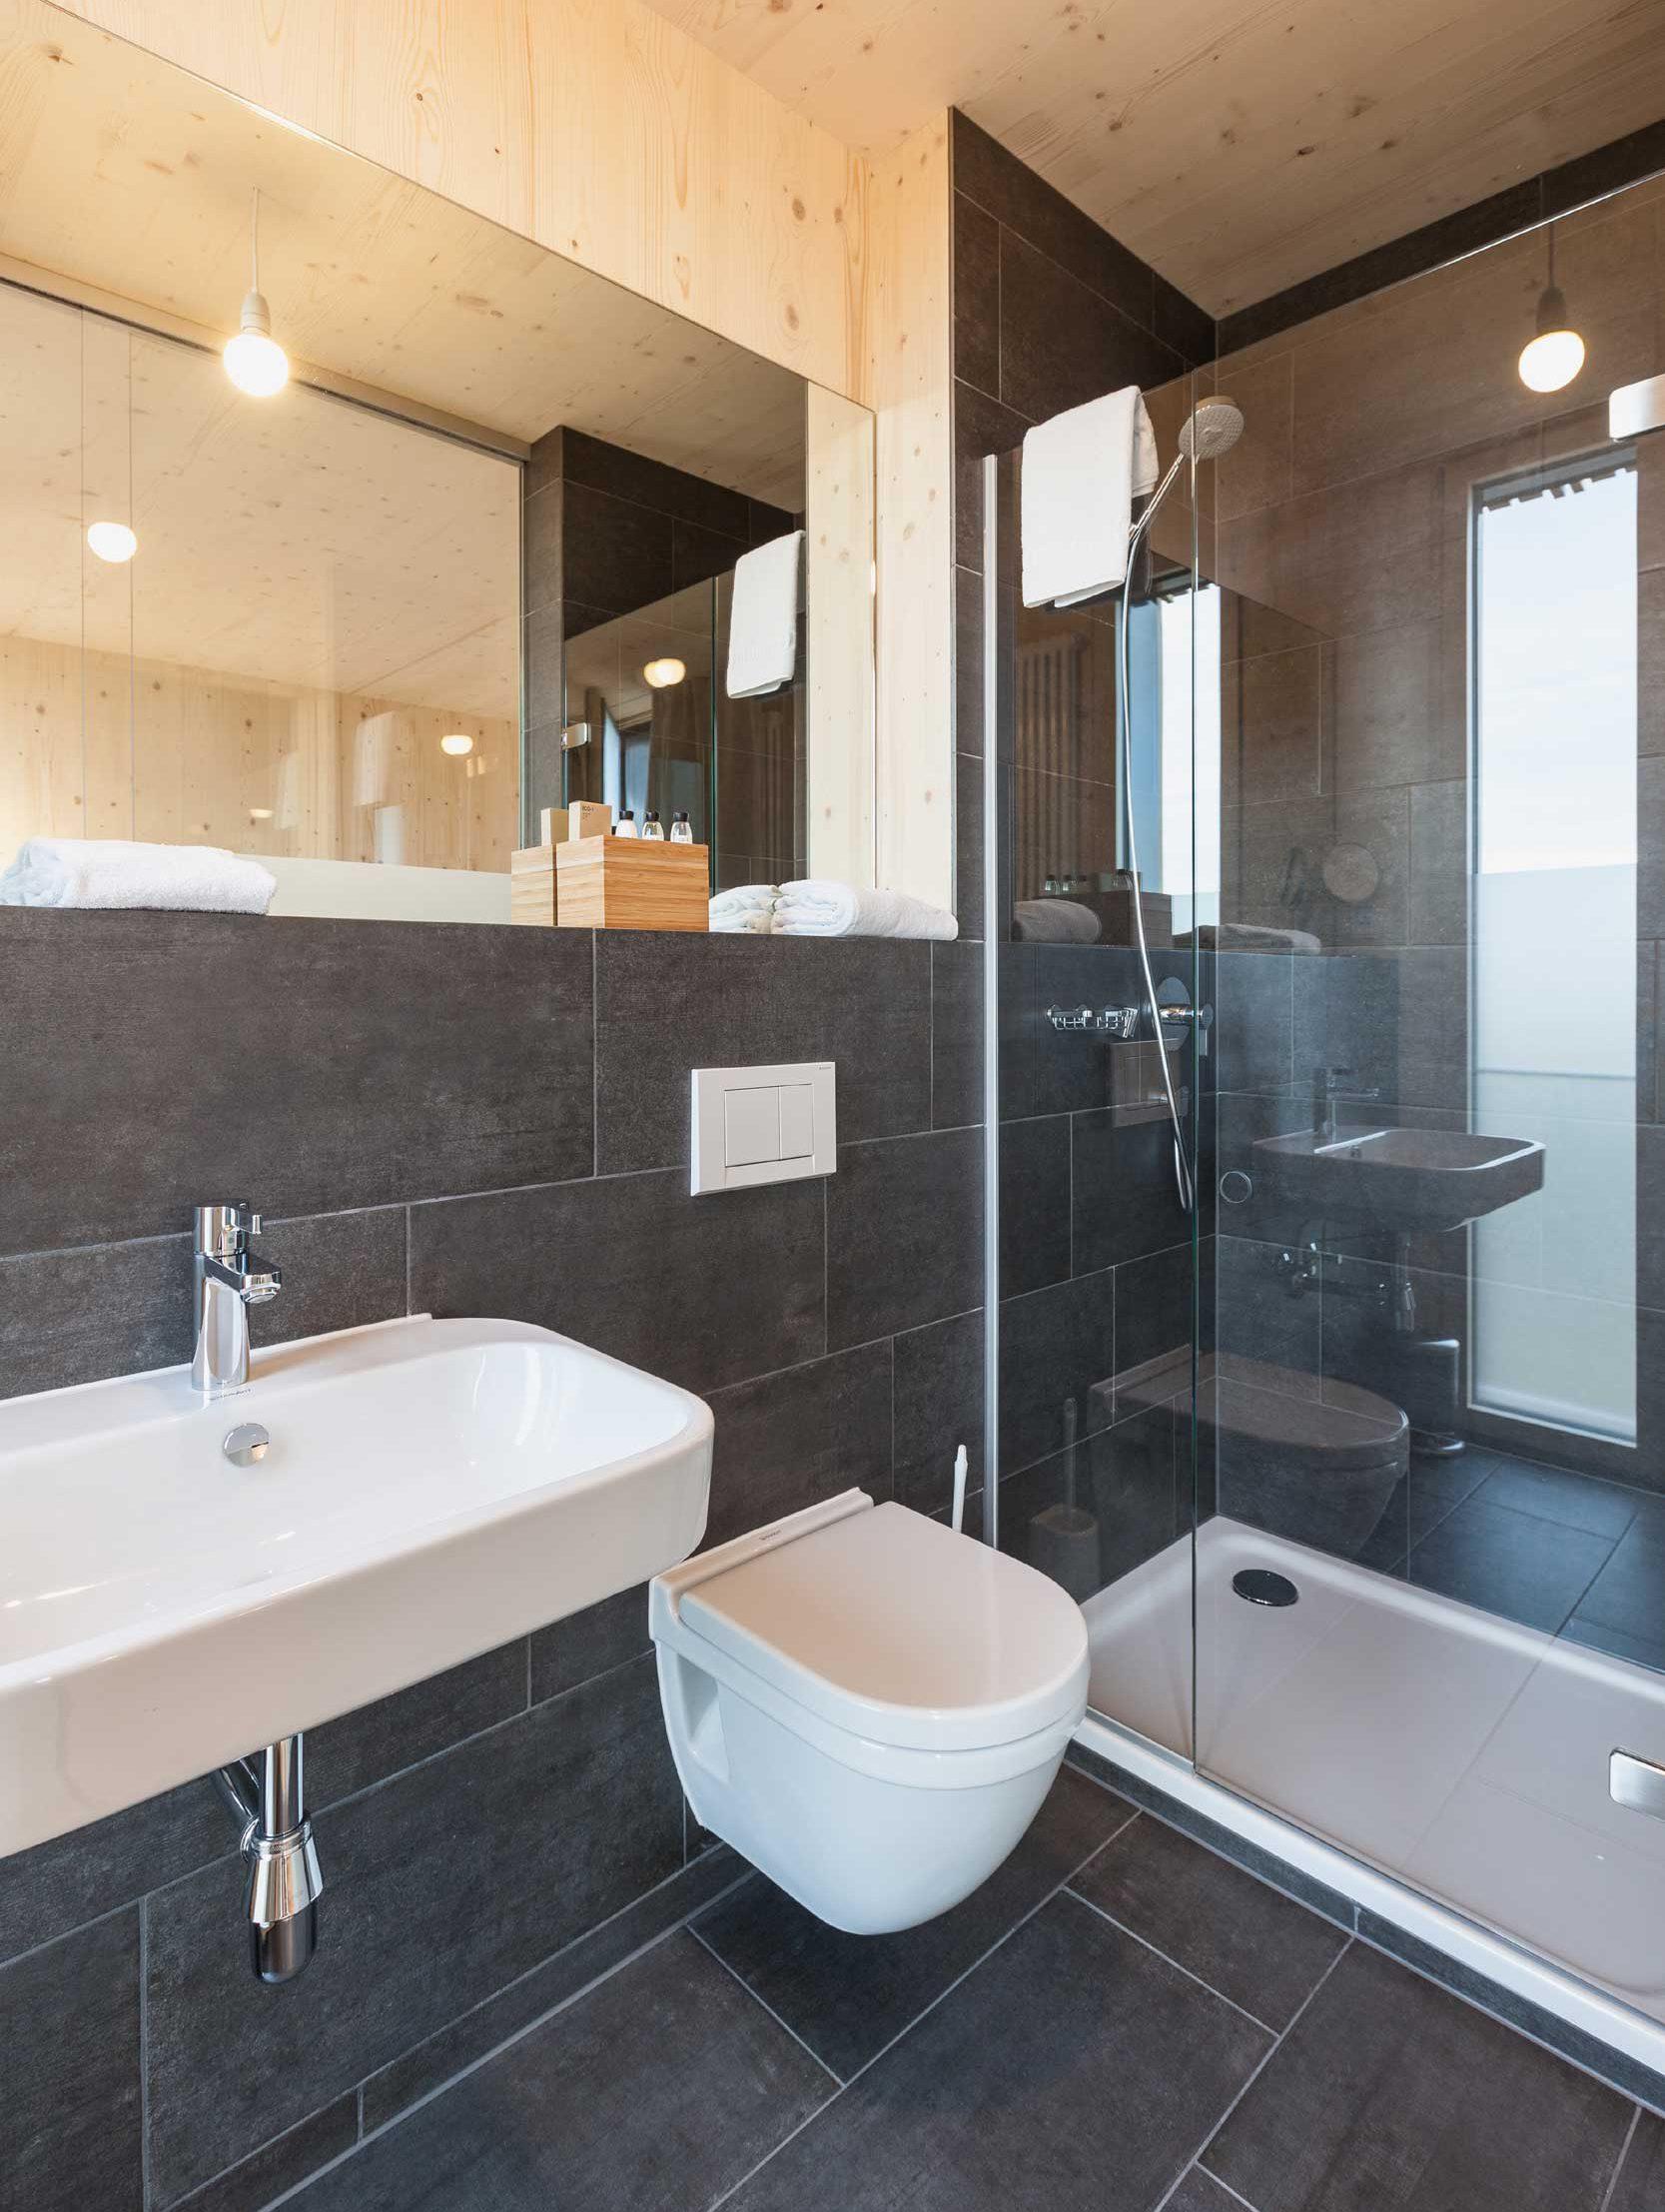 Bader Hotel Badezimmer